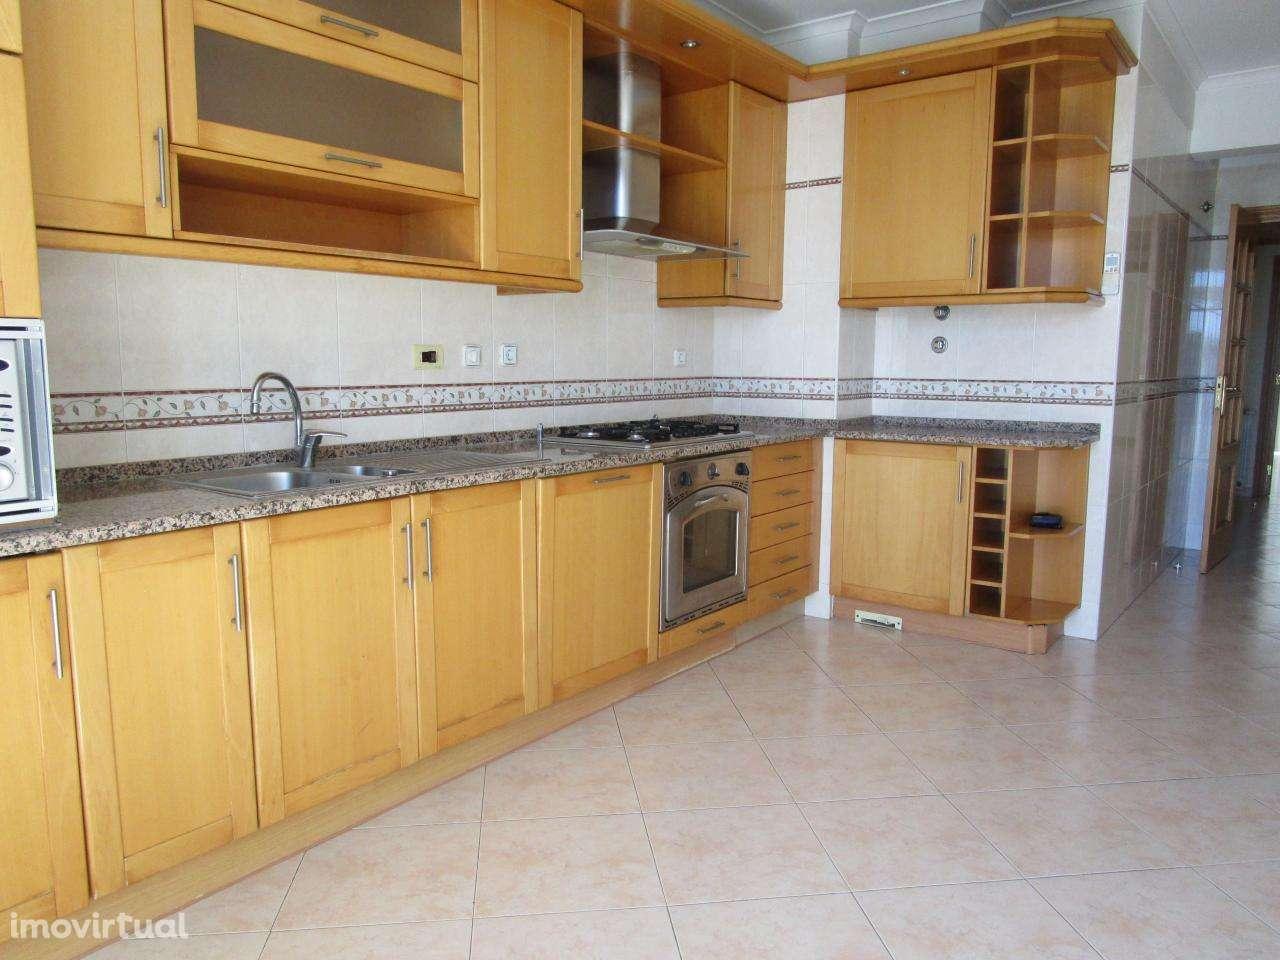 Apartamento para comprar, Vialonga, Vila Franca de Xira, Lisboa - Foto 7